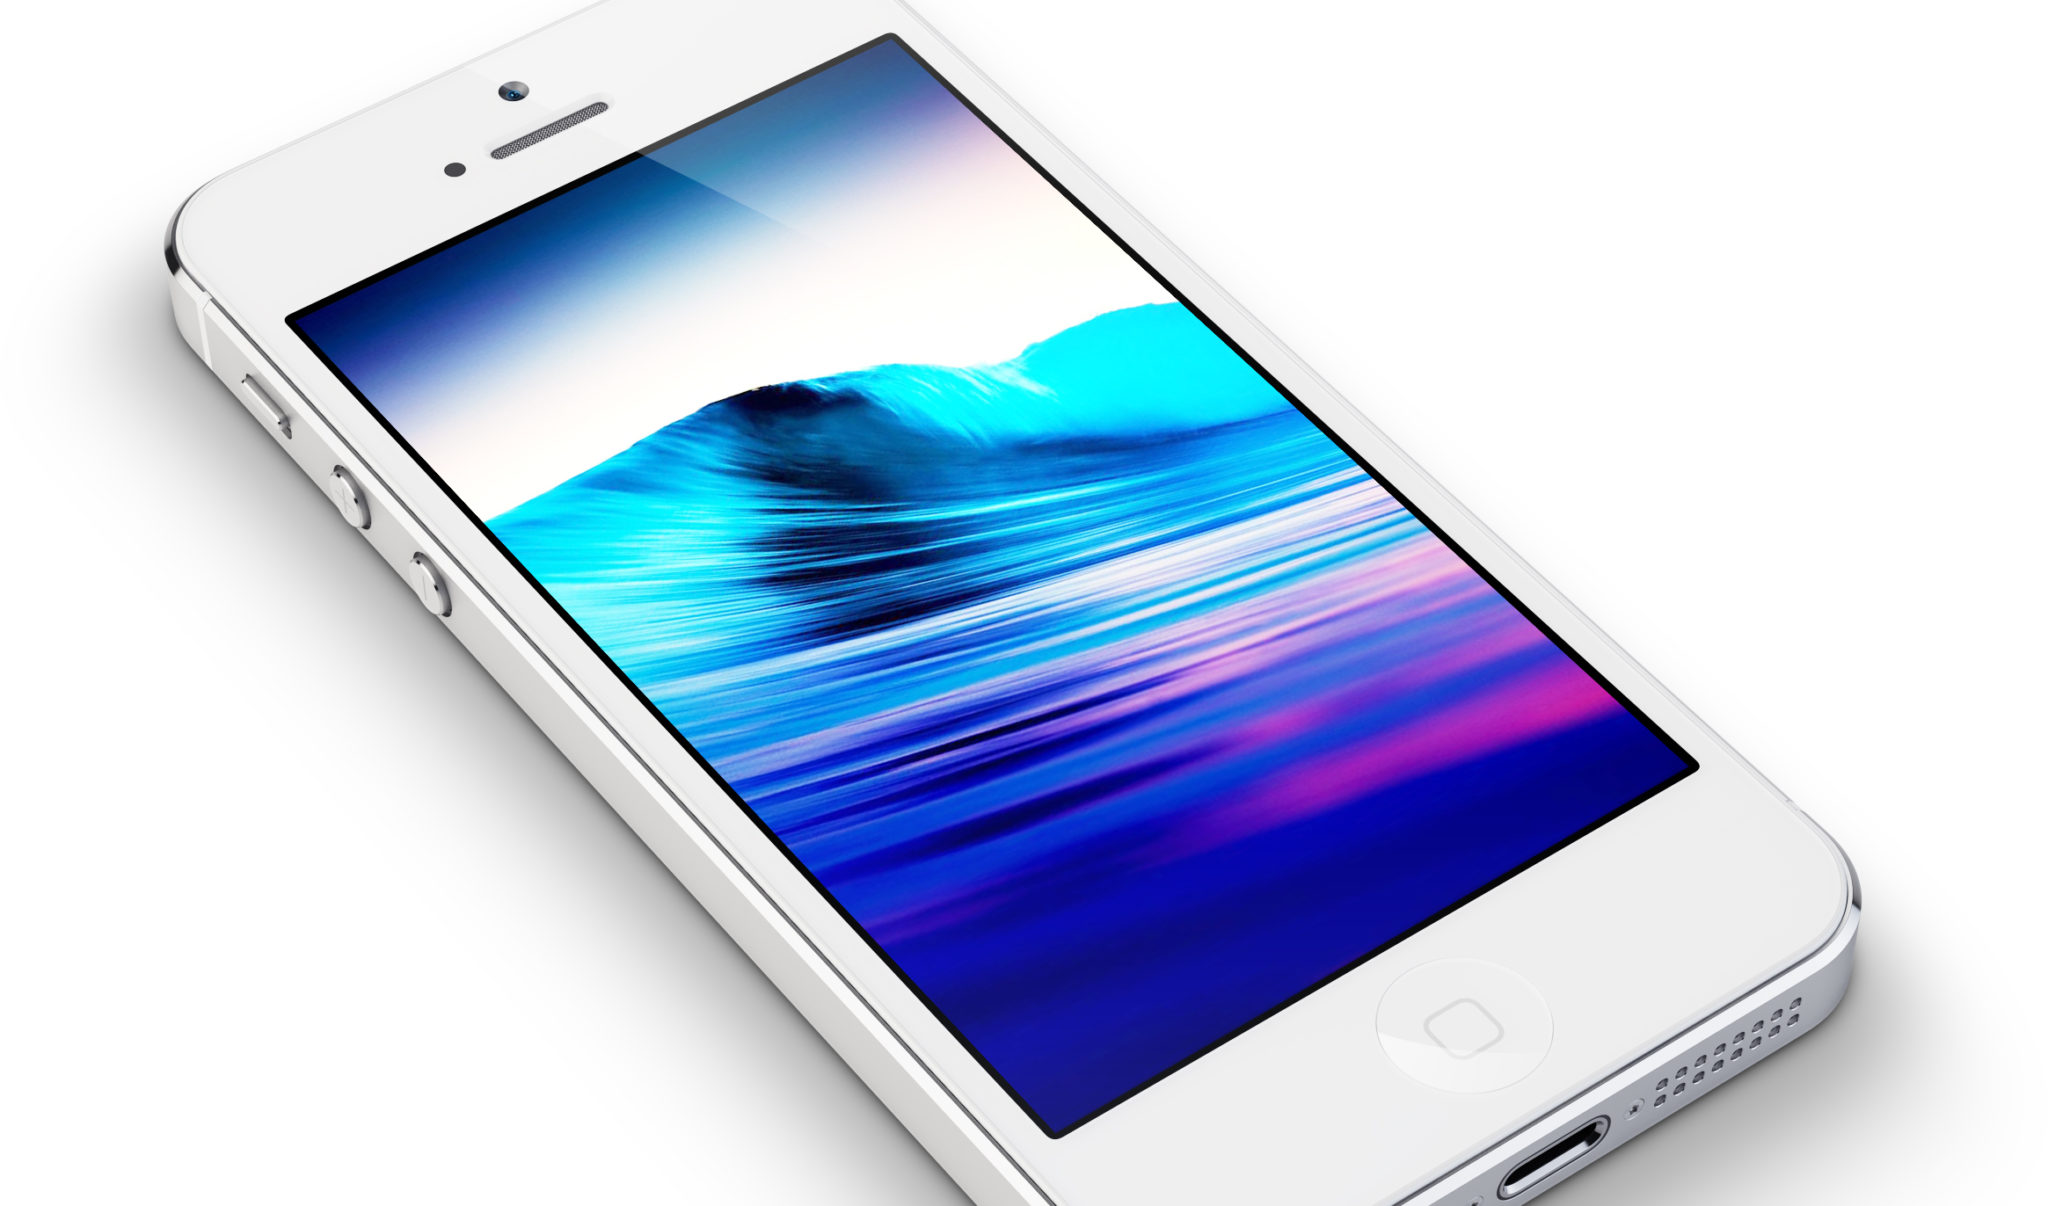 bakgrundsbilder-iphone5